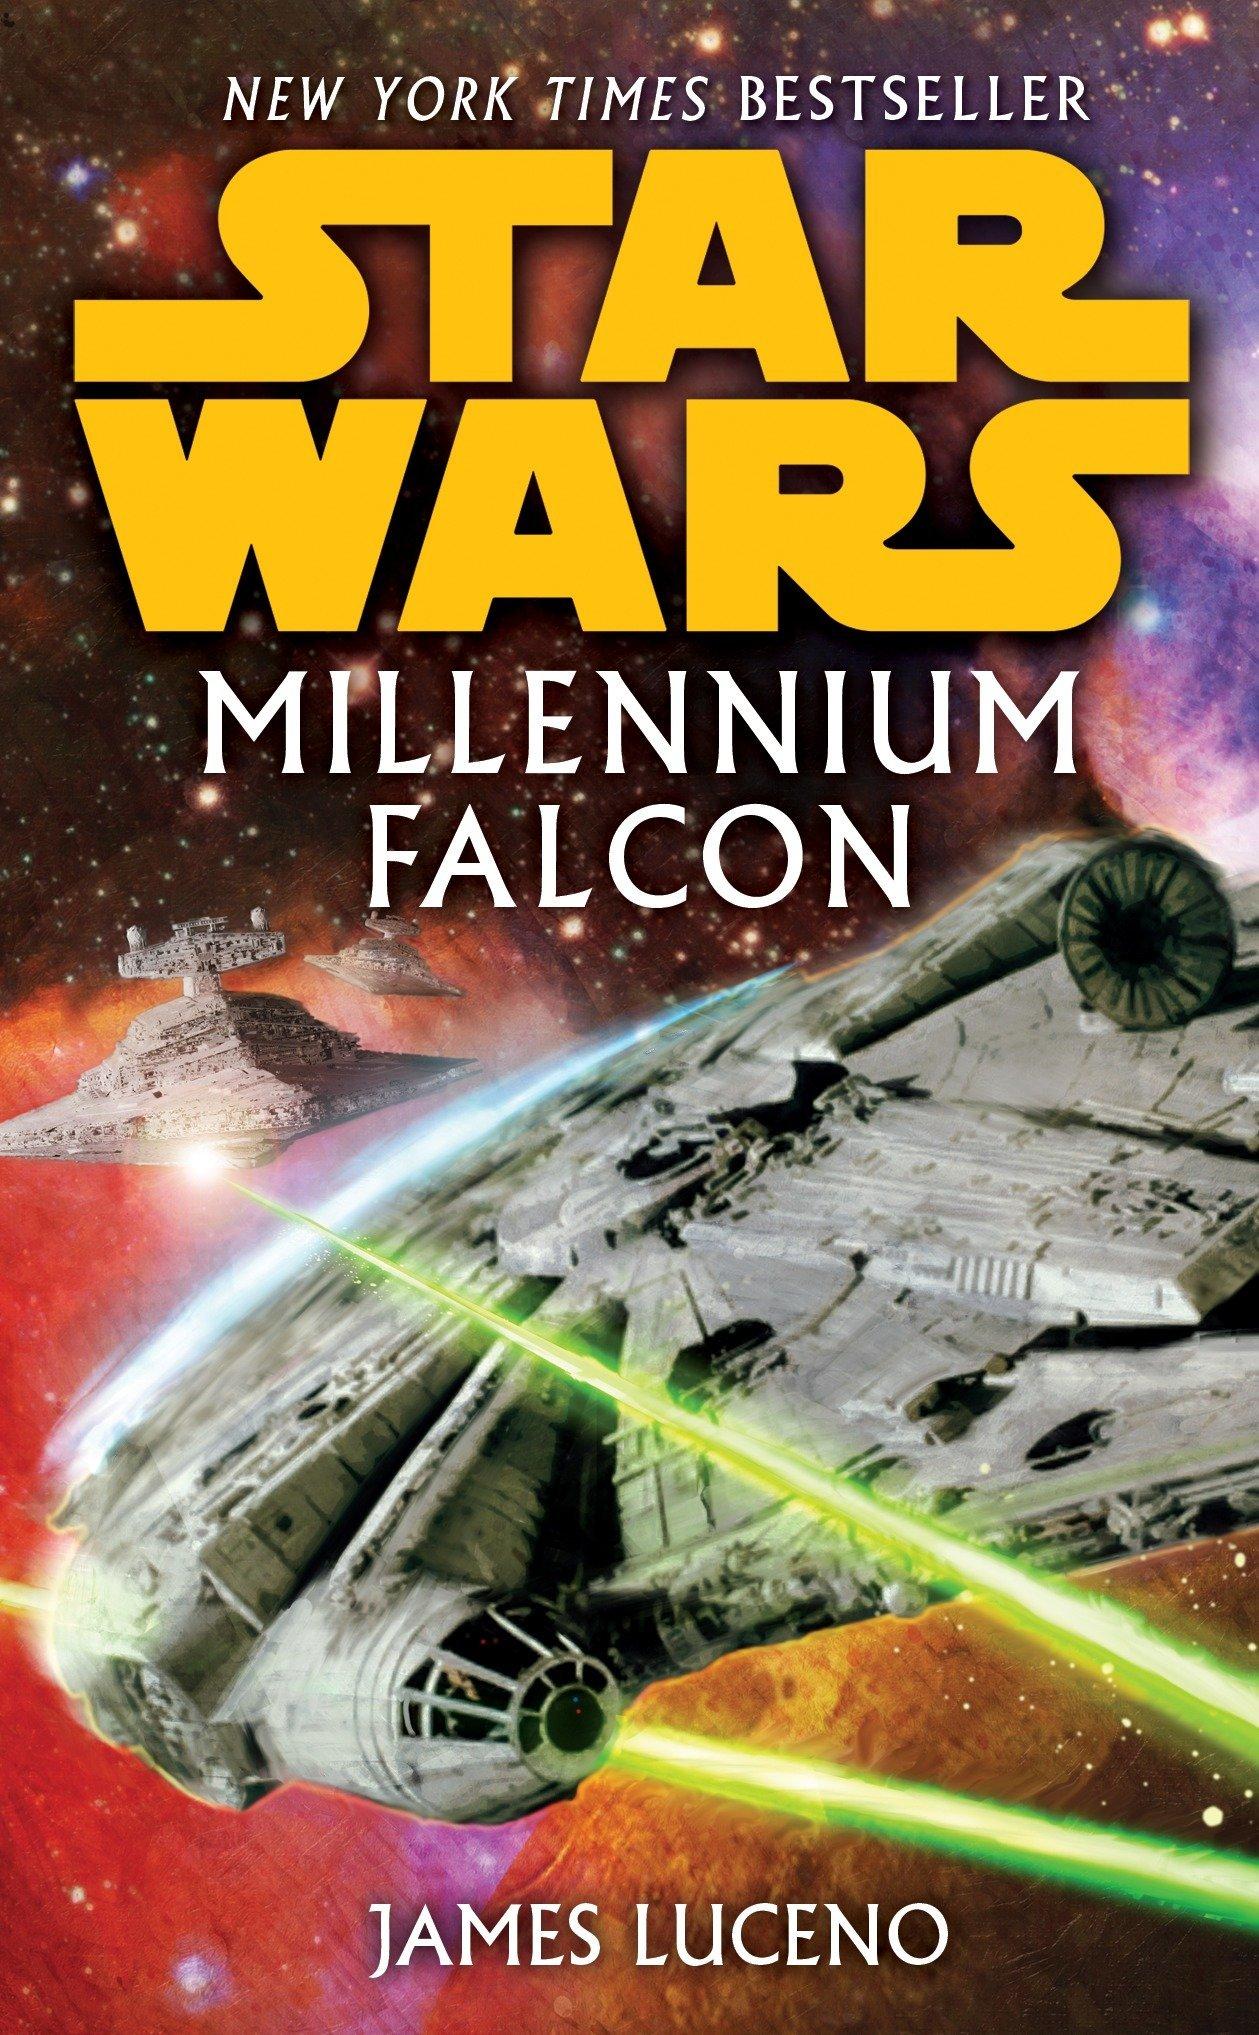 Star Wars: Millennium Falcon  (paperback)